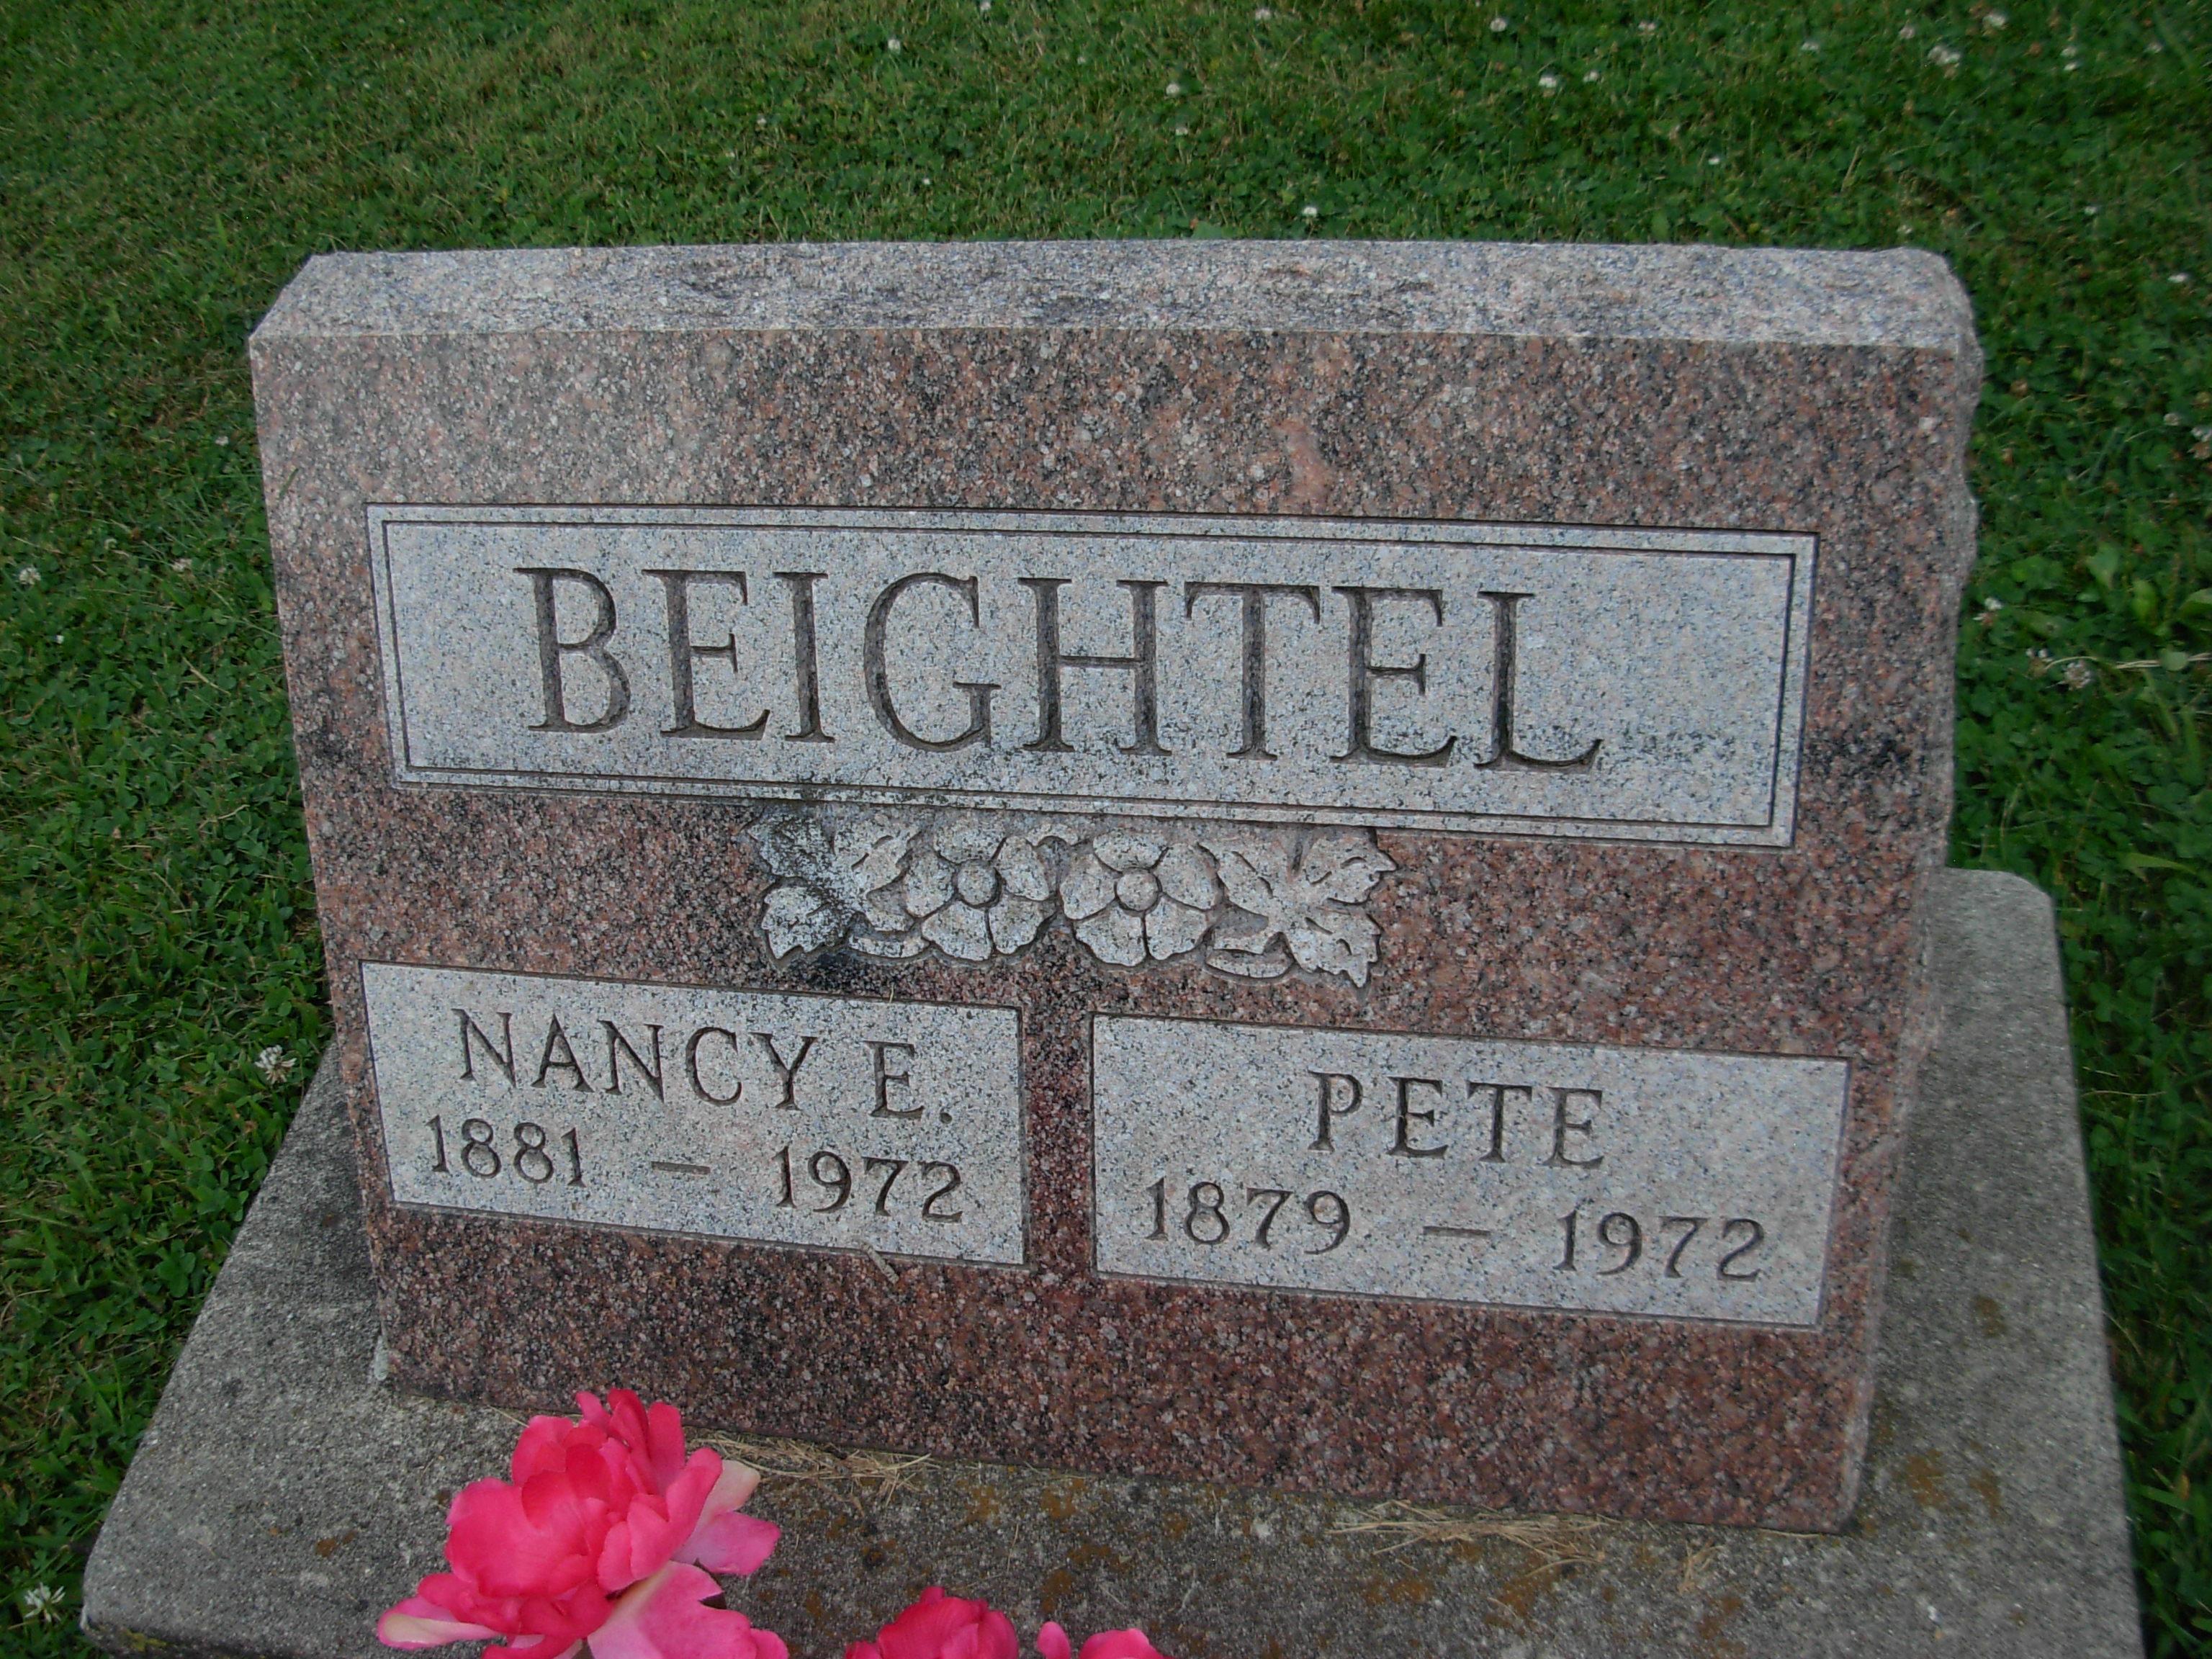 Peter Abraham Pete Beightel